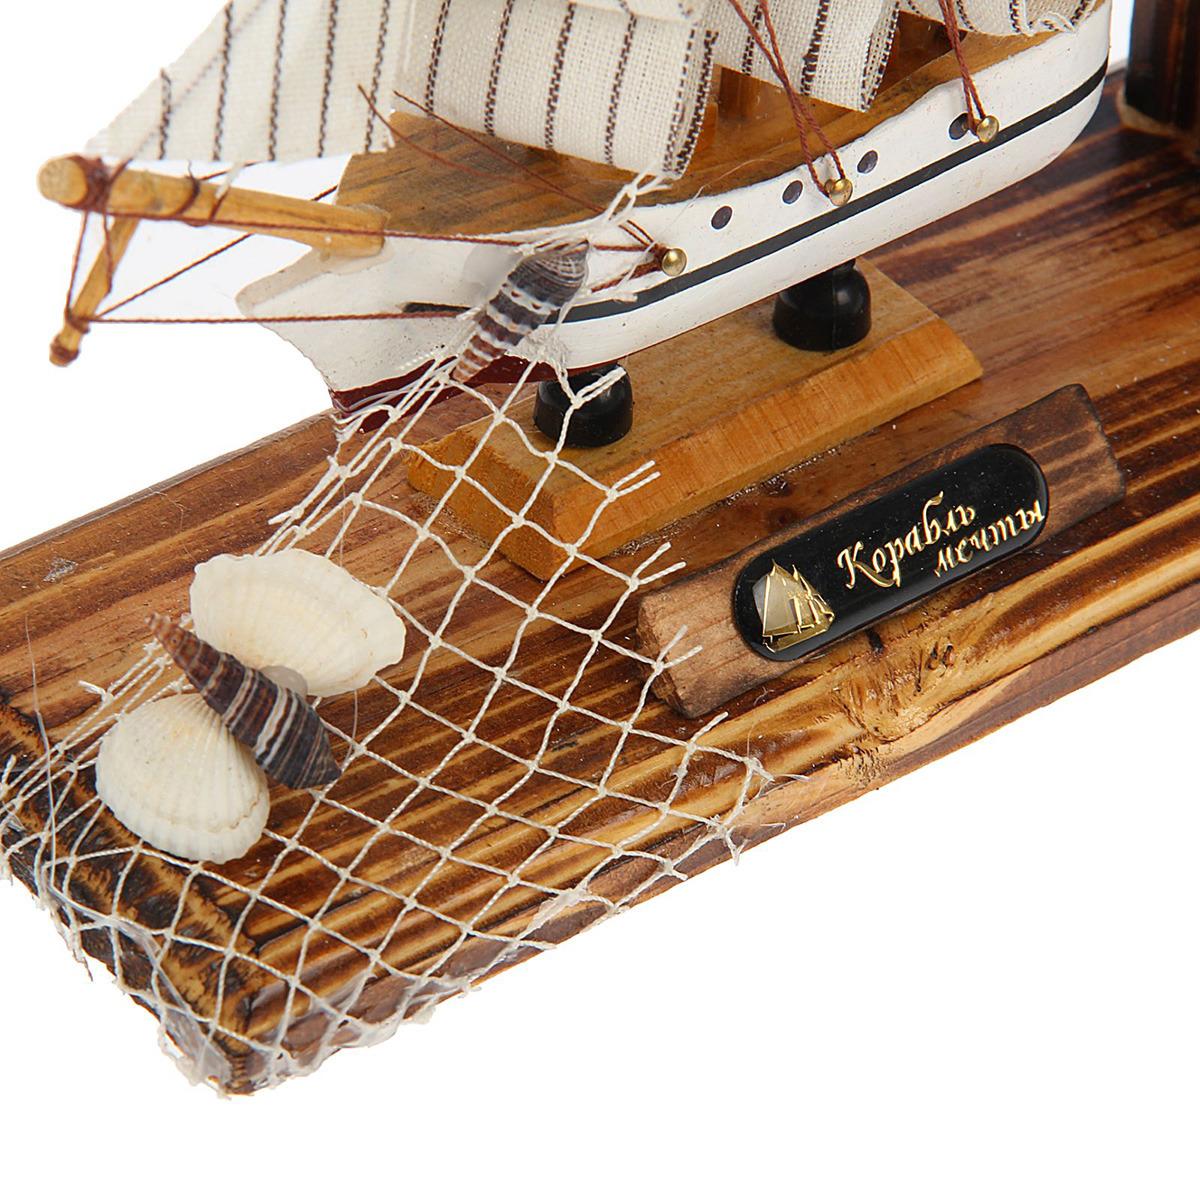 Подставка для визиток Корабль, с карандашницей, 1531152, коричневый, 15 х 22 см Иу Жусима Крафтс Кампани Лимитед